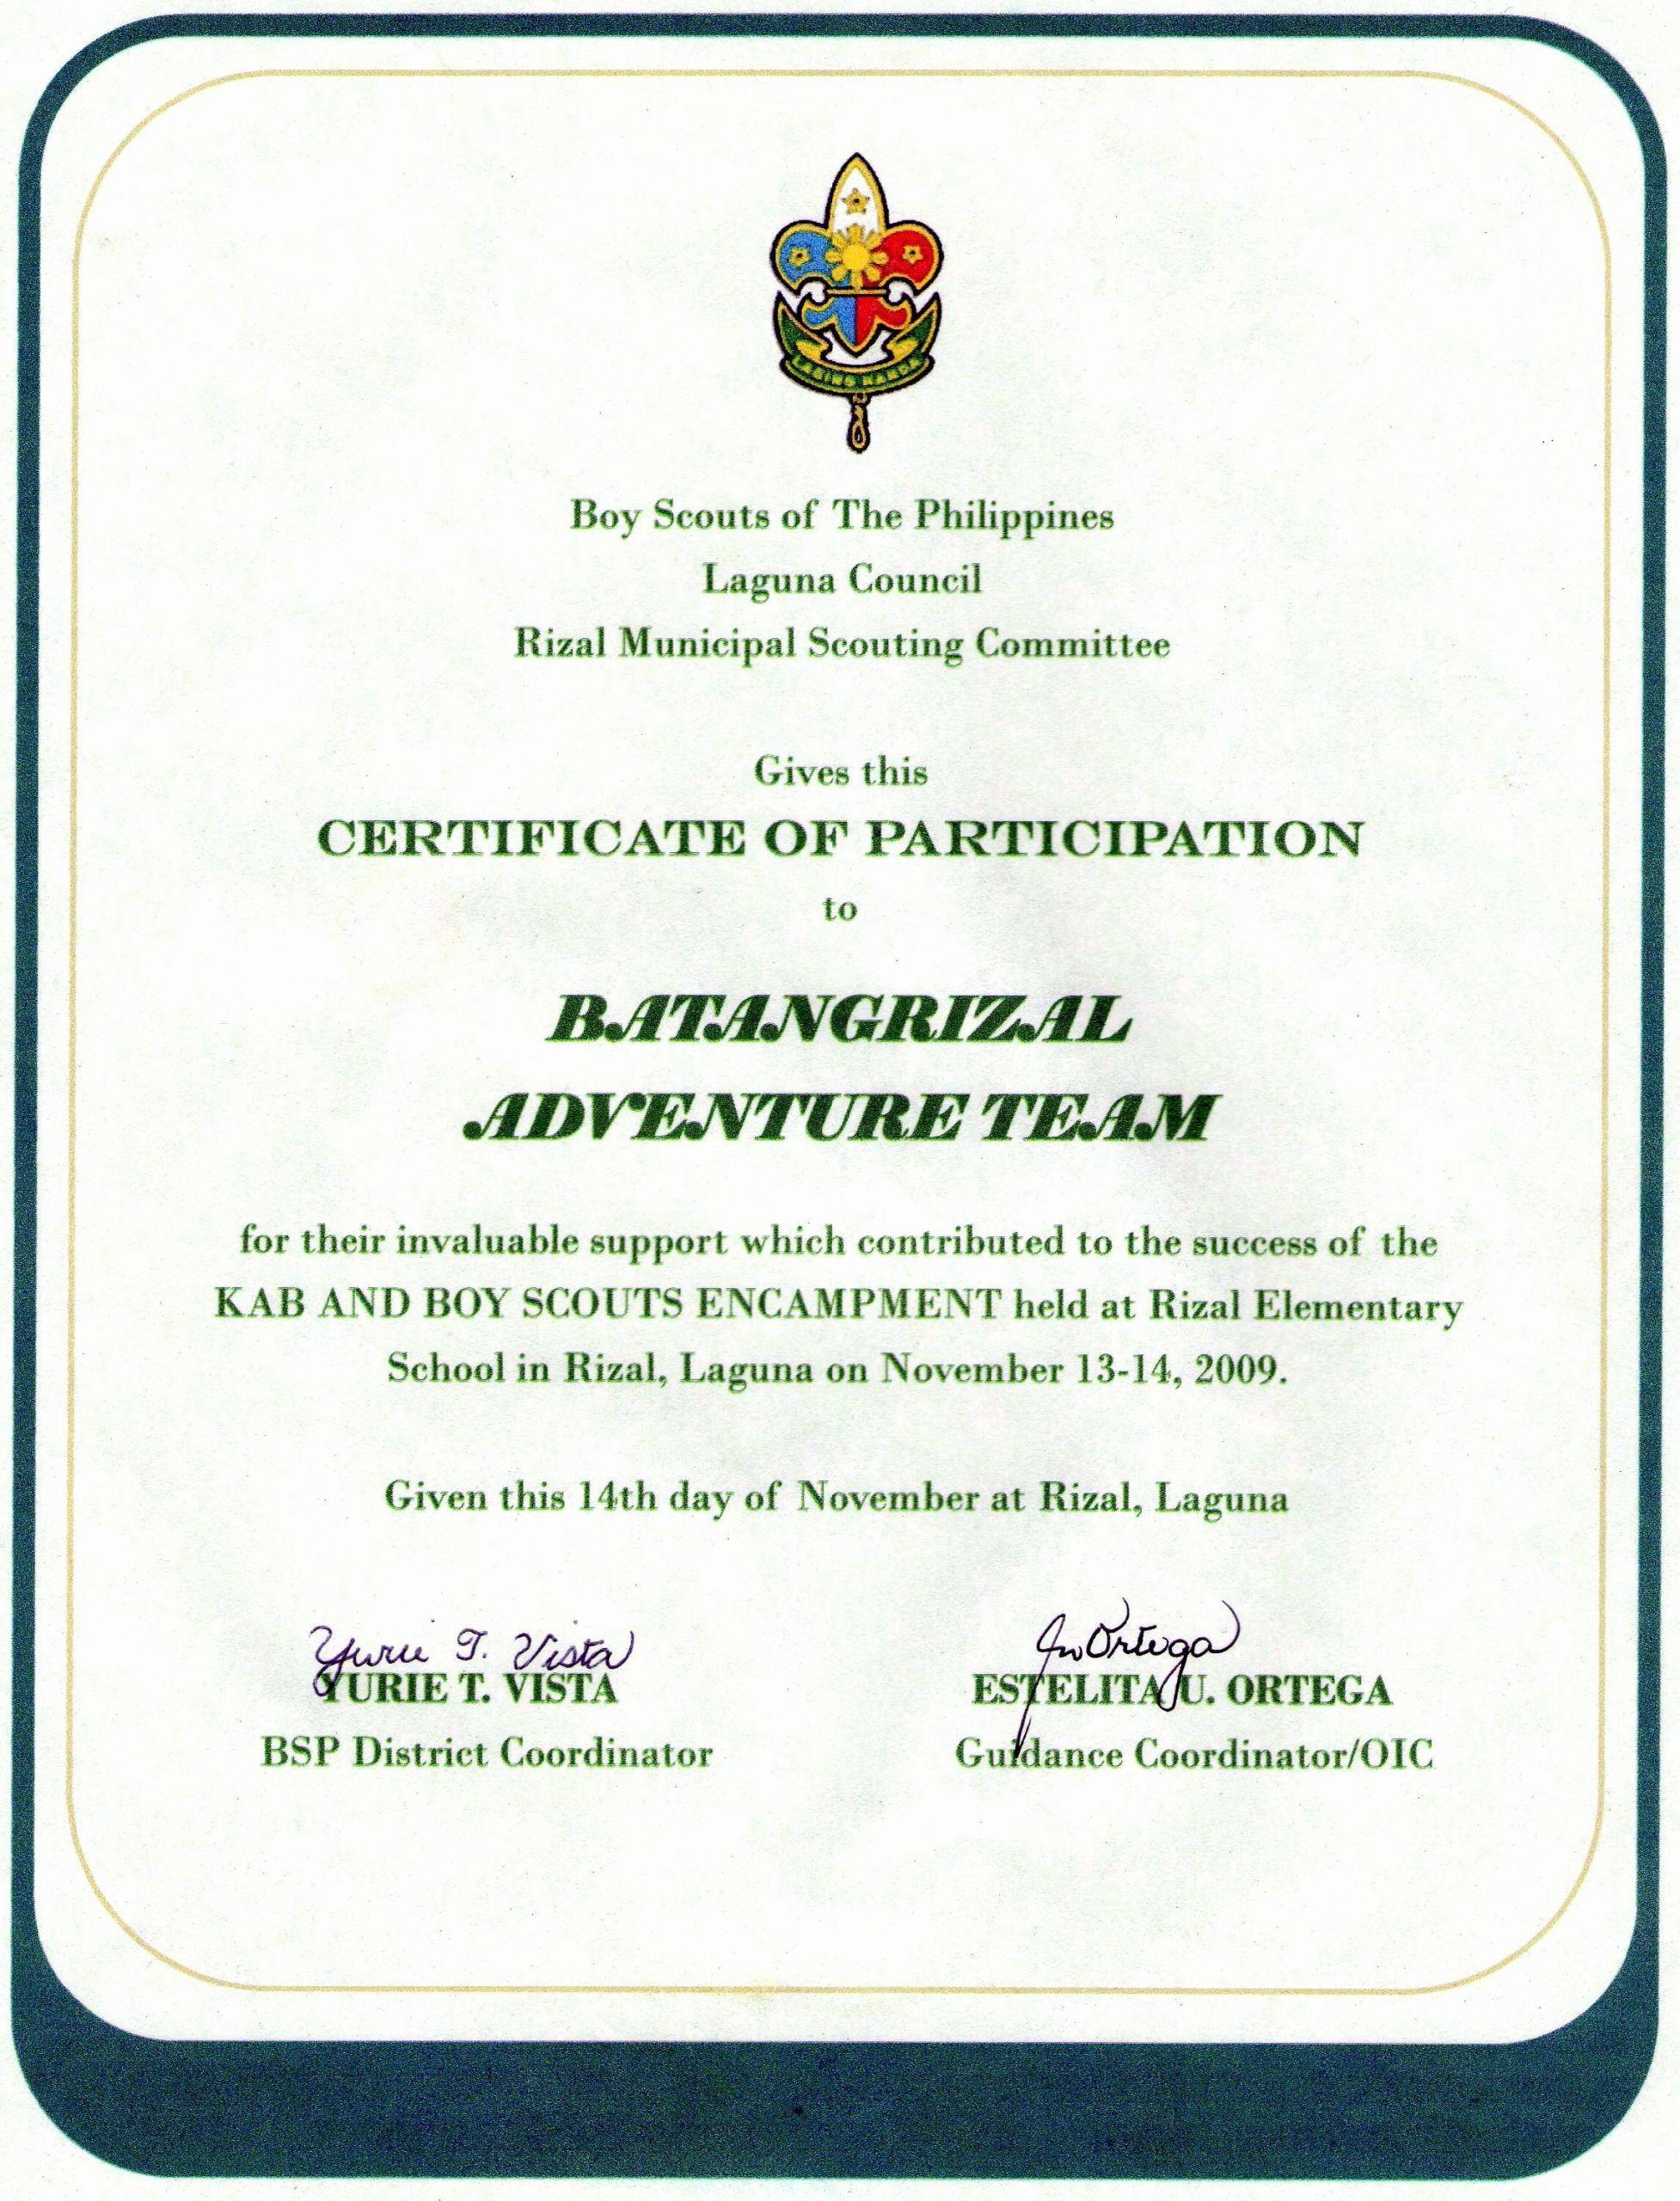 Boy Scout Certificates Templates Luxury Certificate Appreciation Template Boy Scouts